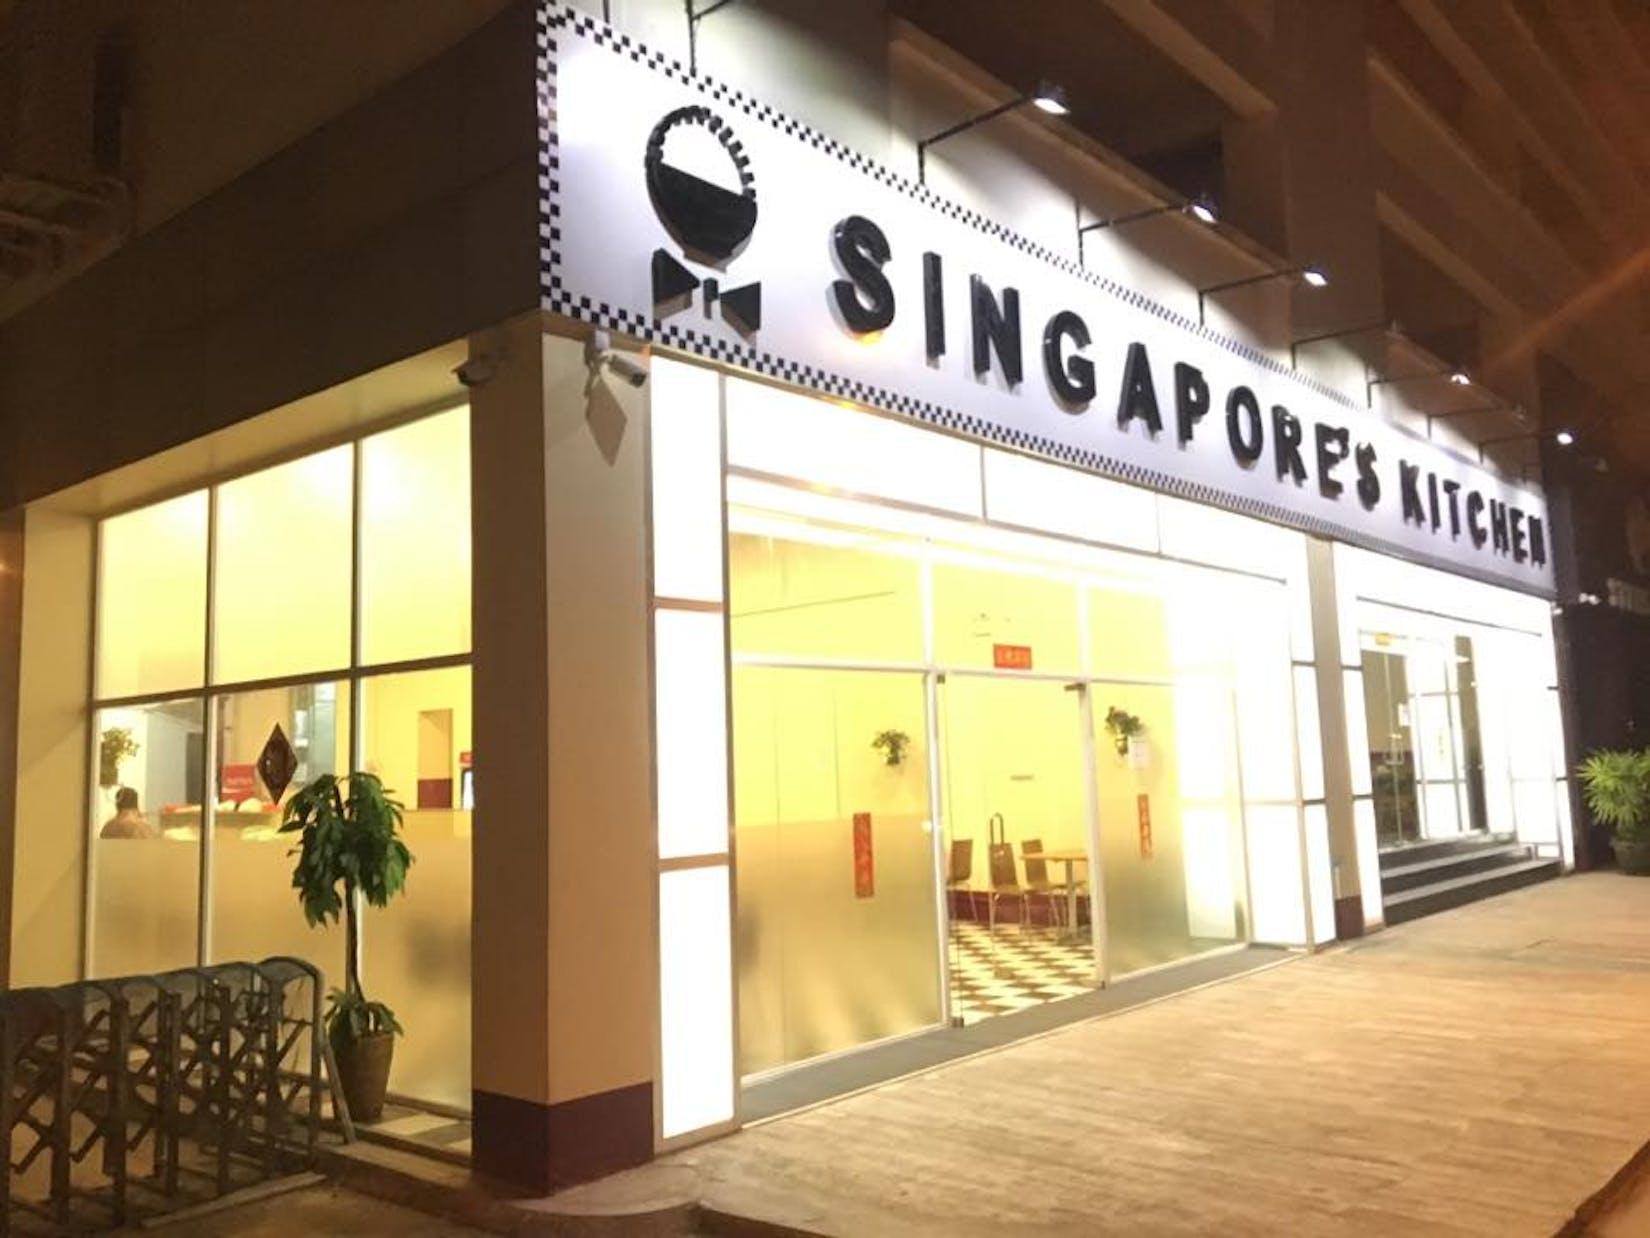 Singapore Kitchen | yathar